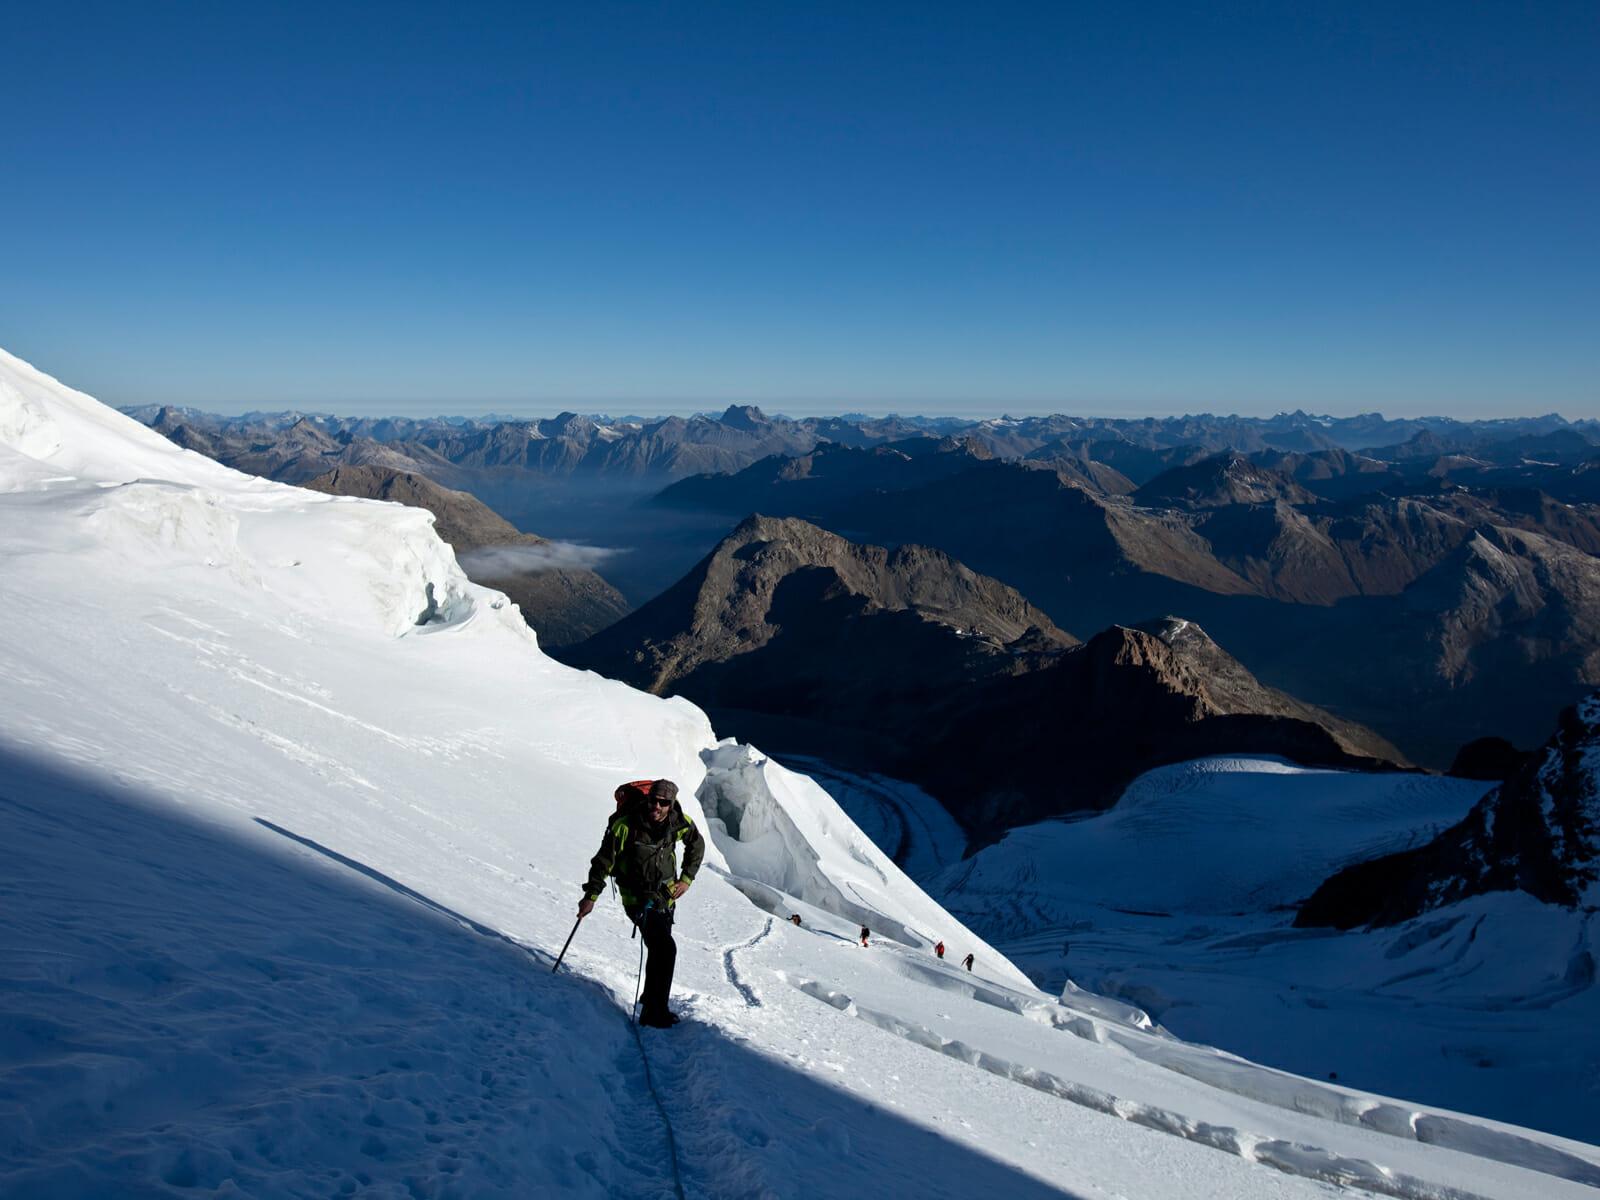 Leichter Klettergurt Für Hochtouren : Hochtouren ausbildung bernina bergsteigerschule pontresina